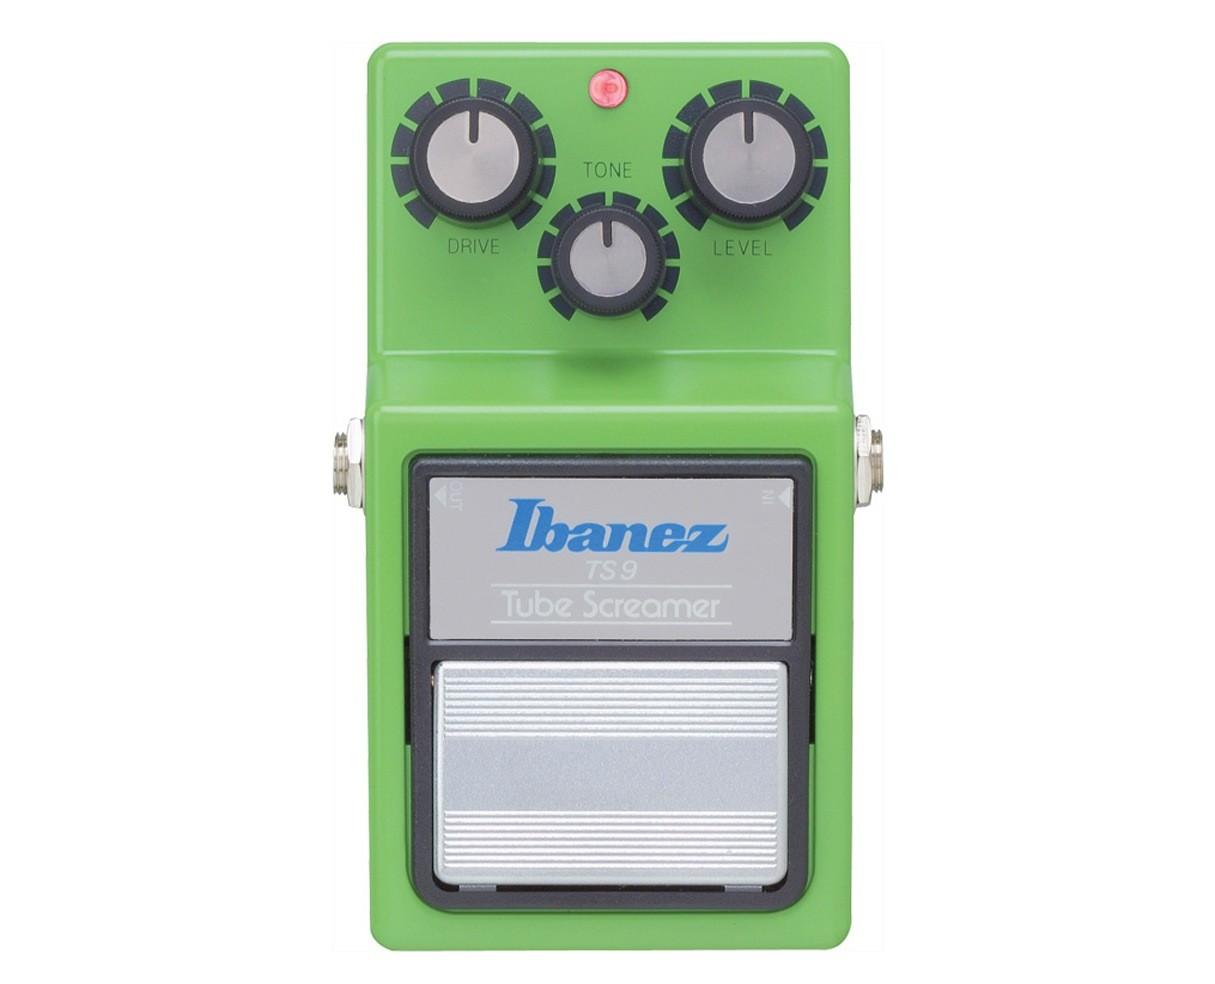 Ibanez TS9 Tube Screamer Overdrive Pedal Open Box